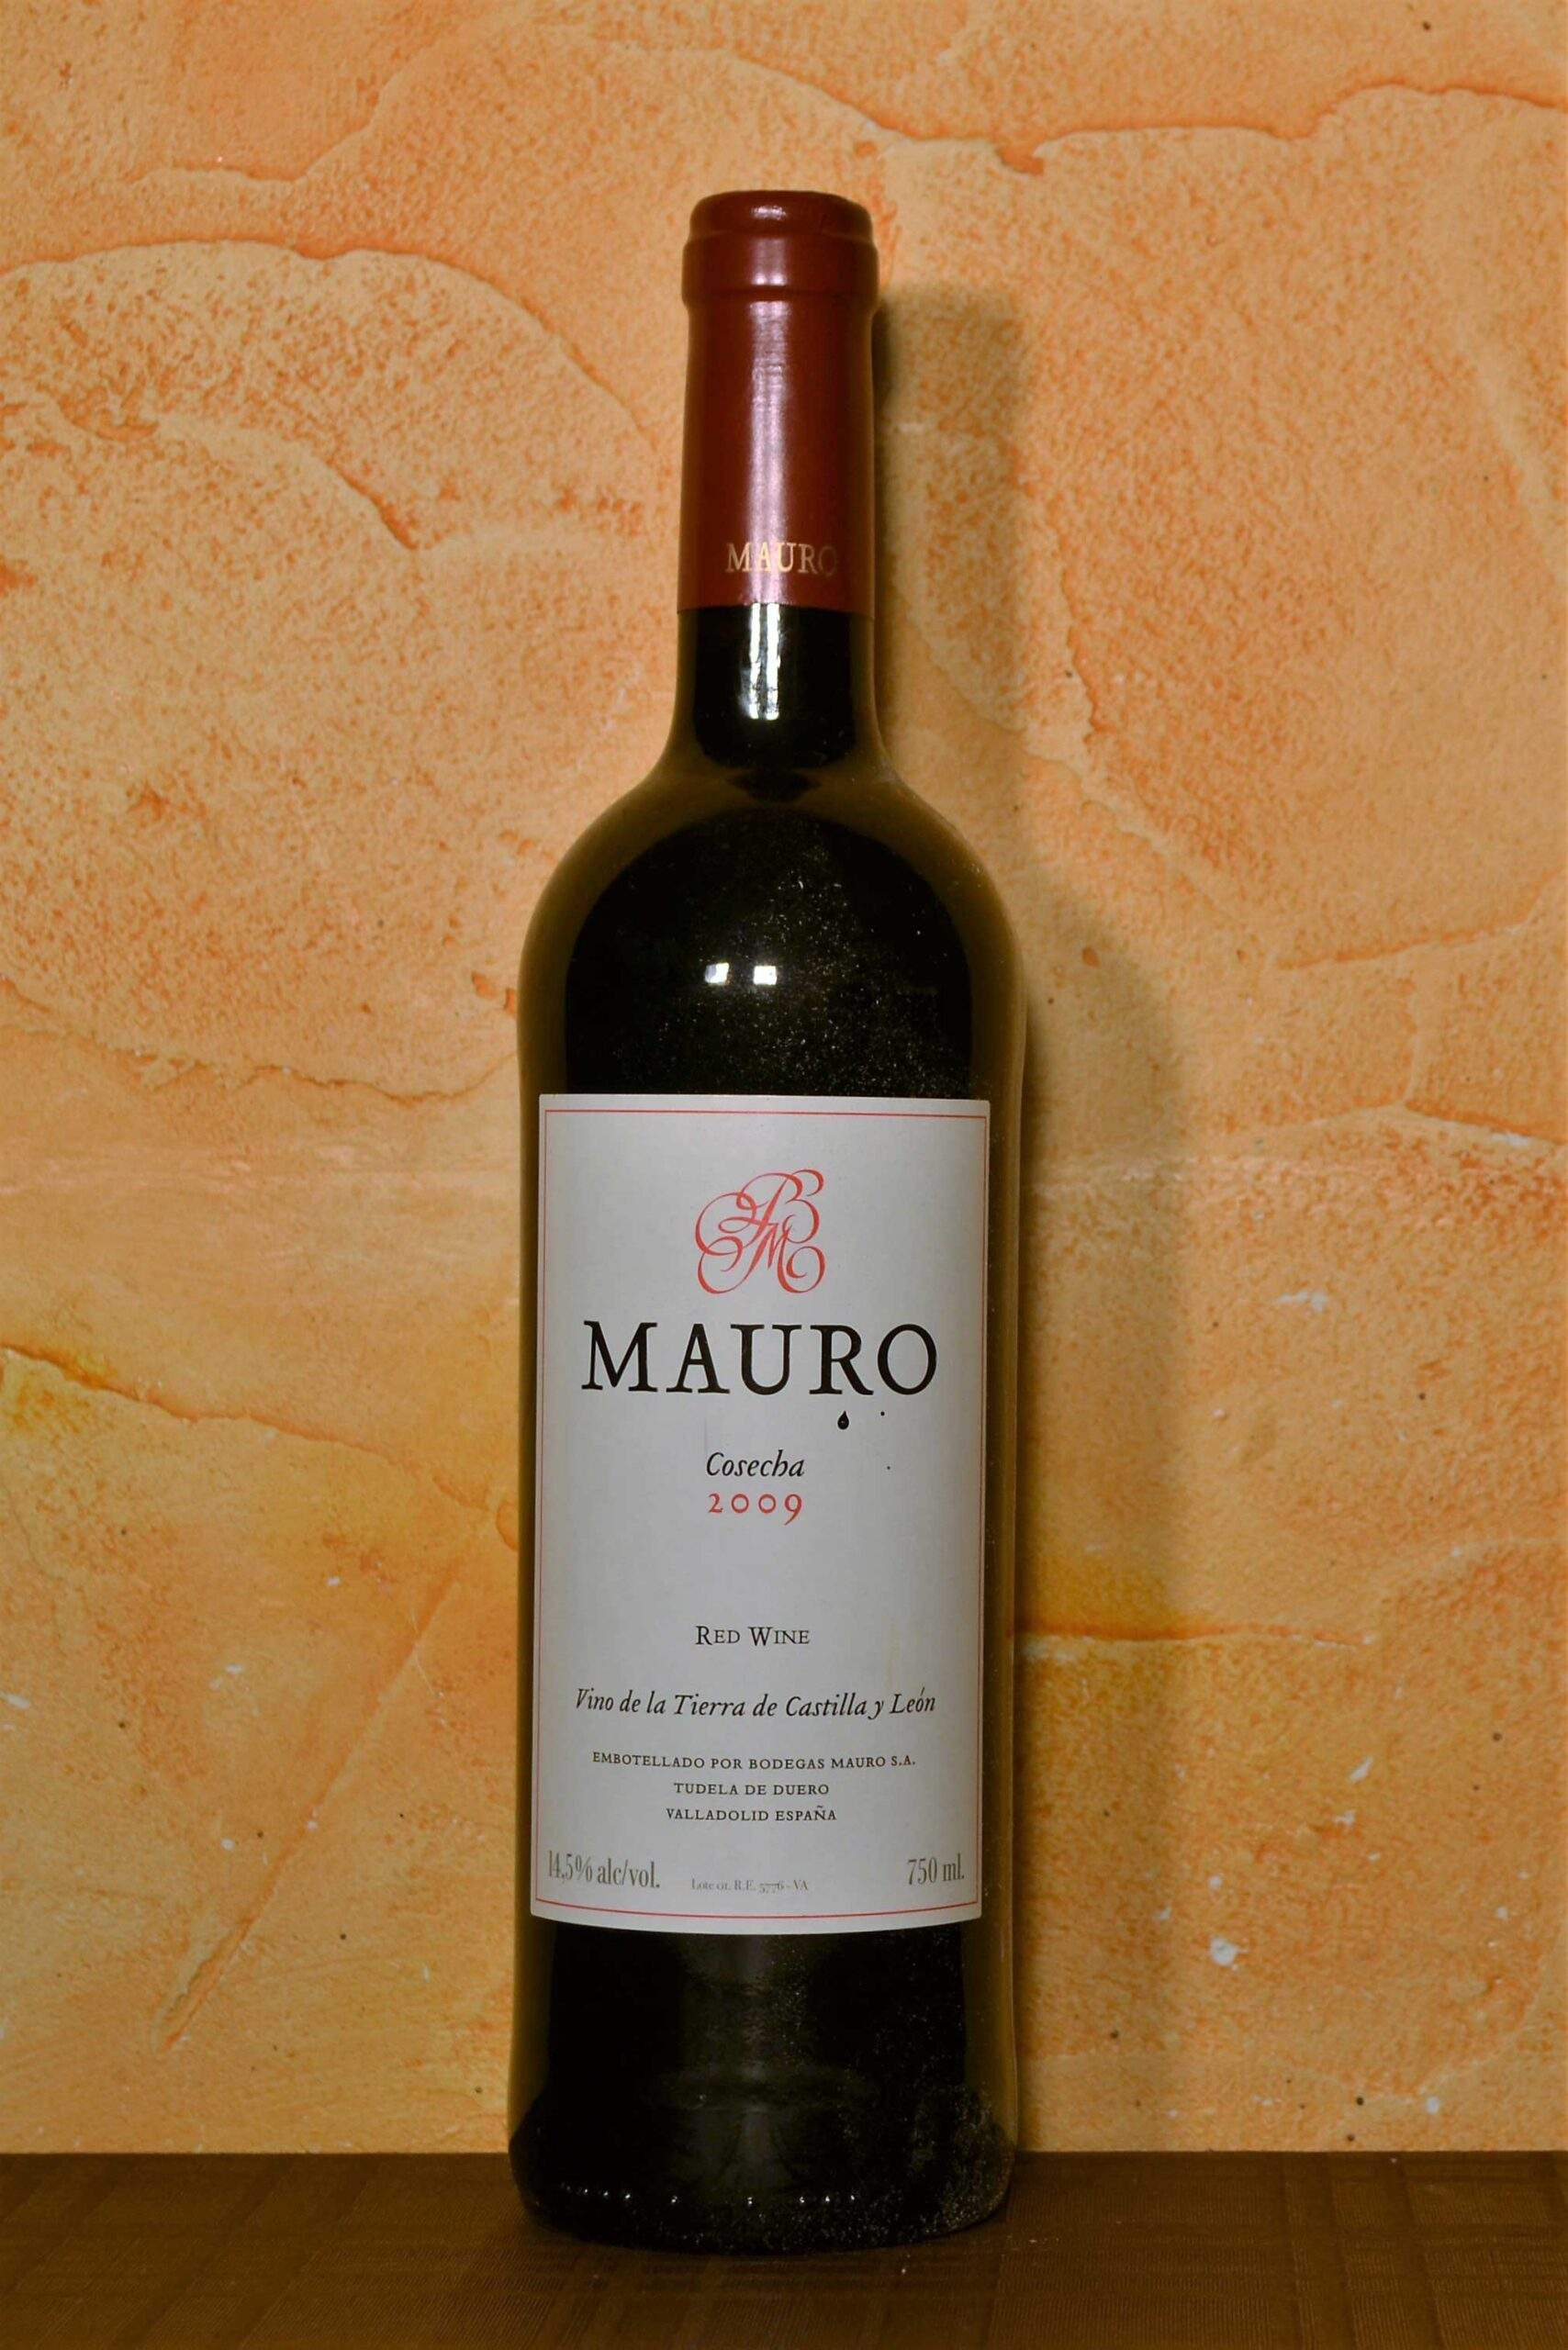 Mauro 2009